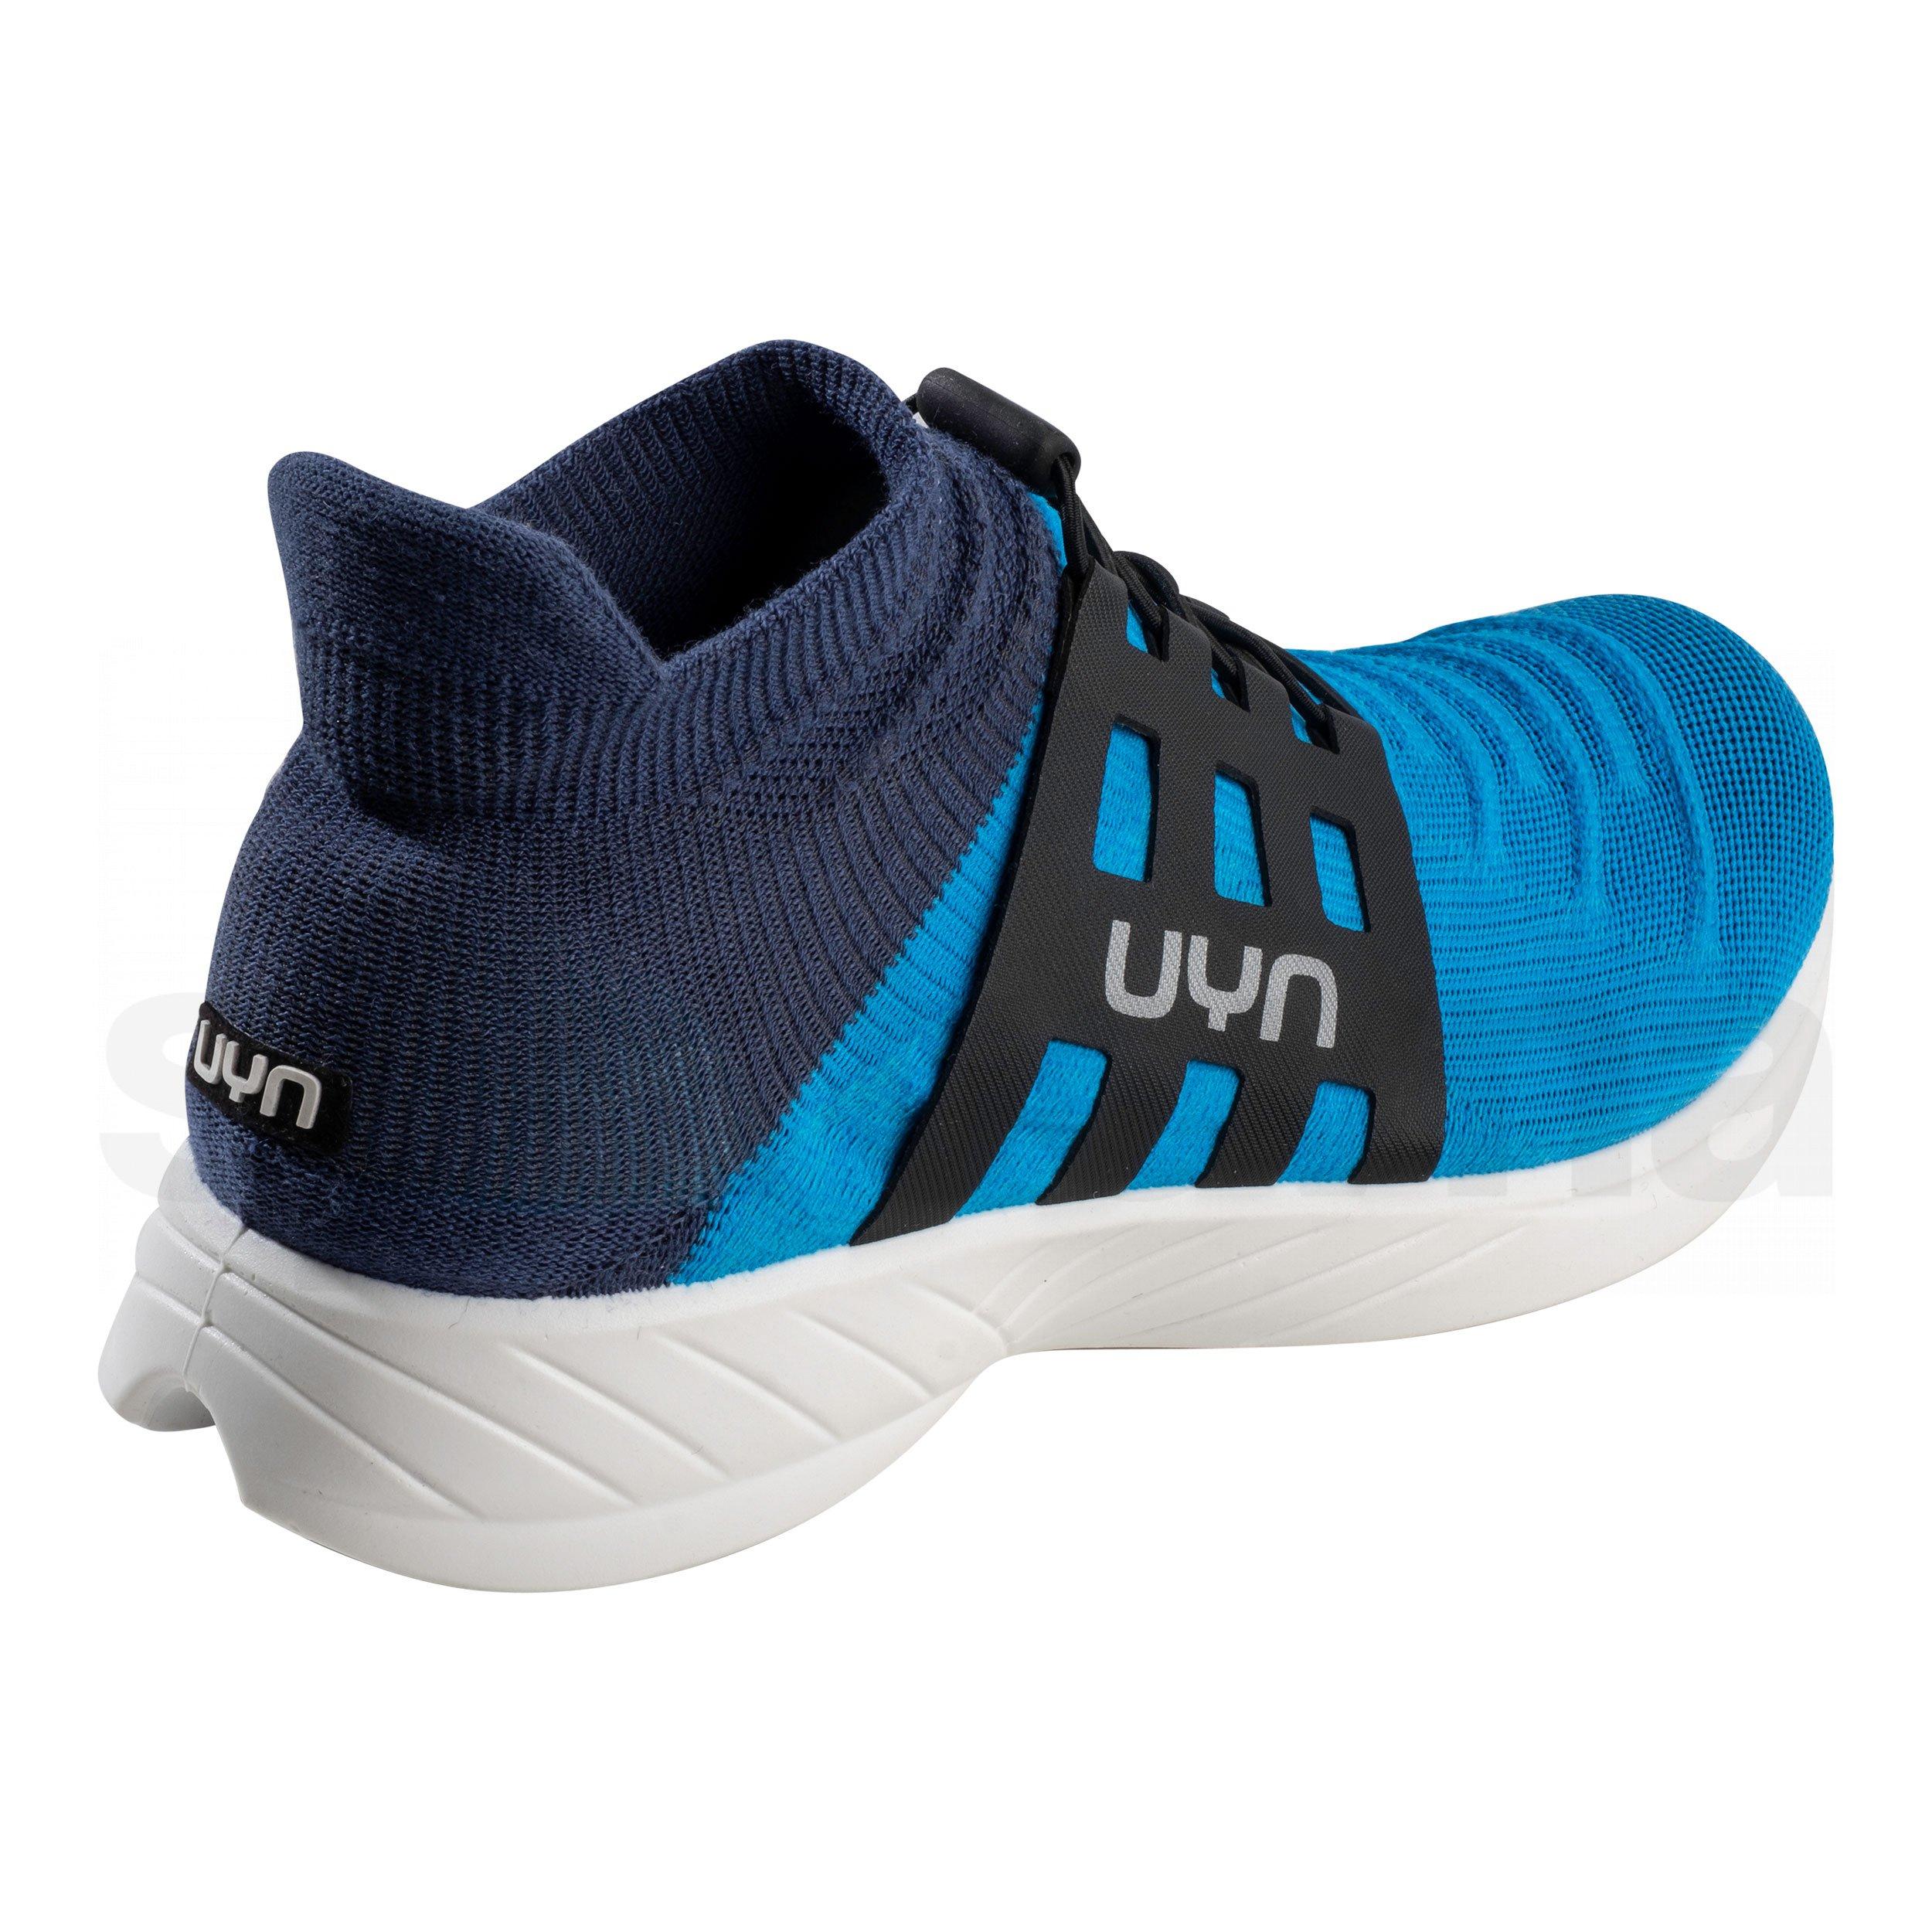 Obuv UYN X-Cross Tune M - modrá